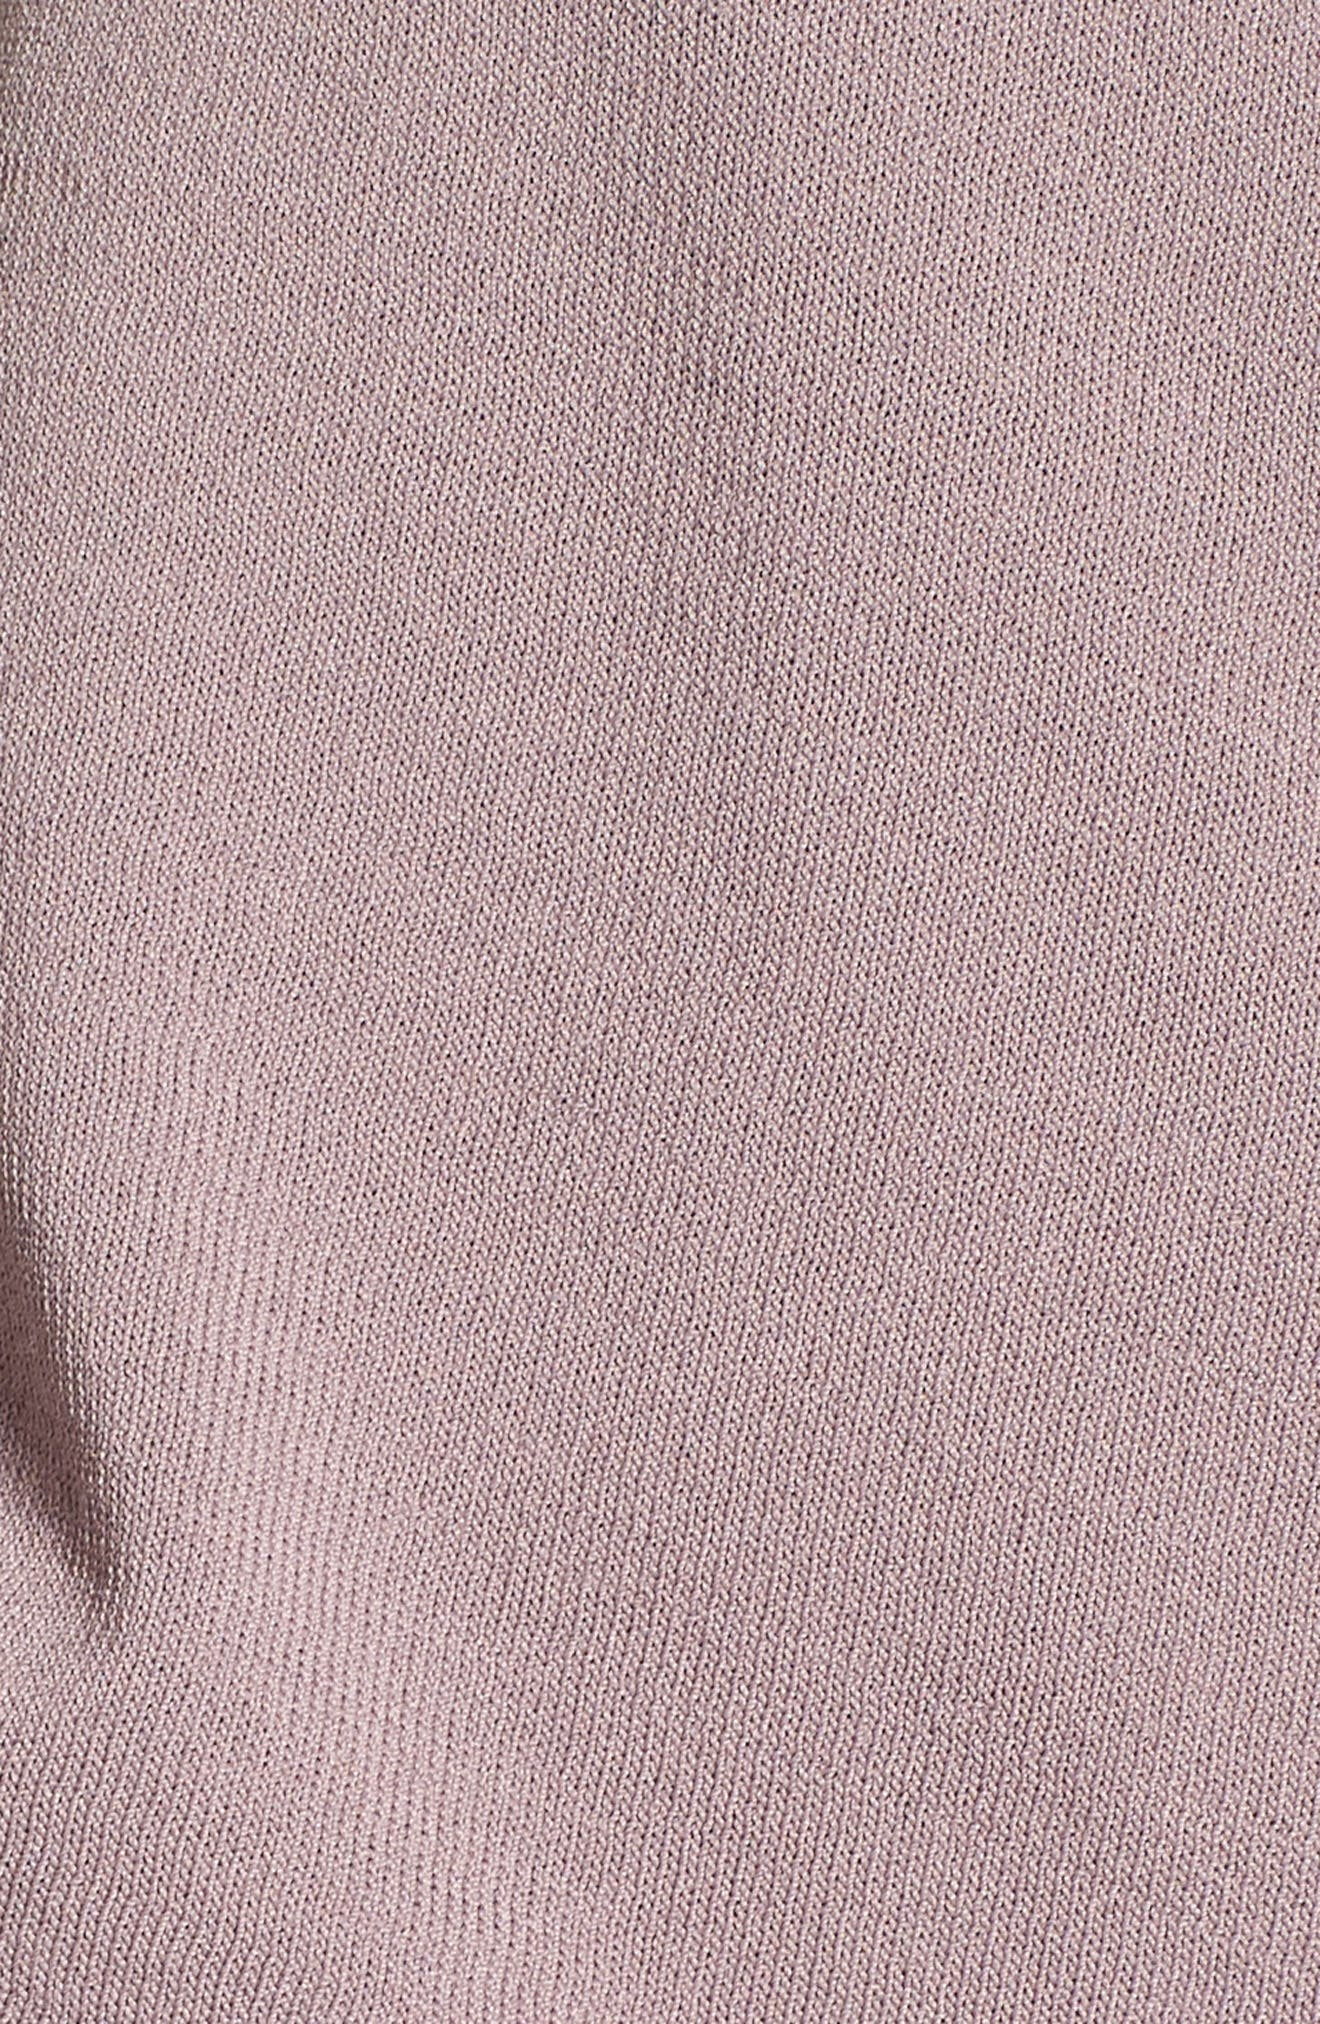 Ballet Wrap Sweater,                             Alternate thumbnail 10, color,